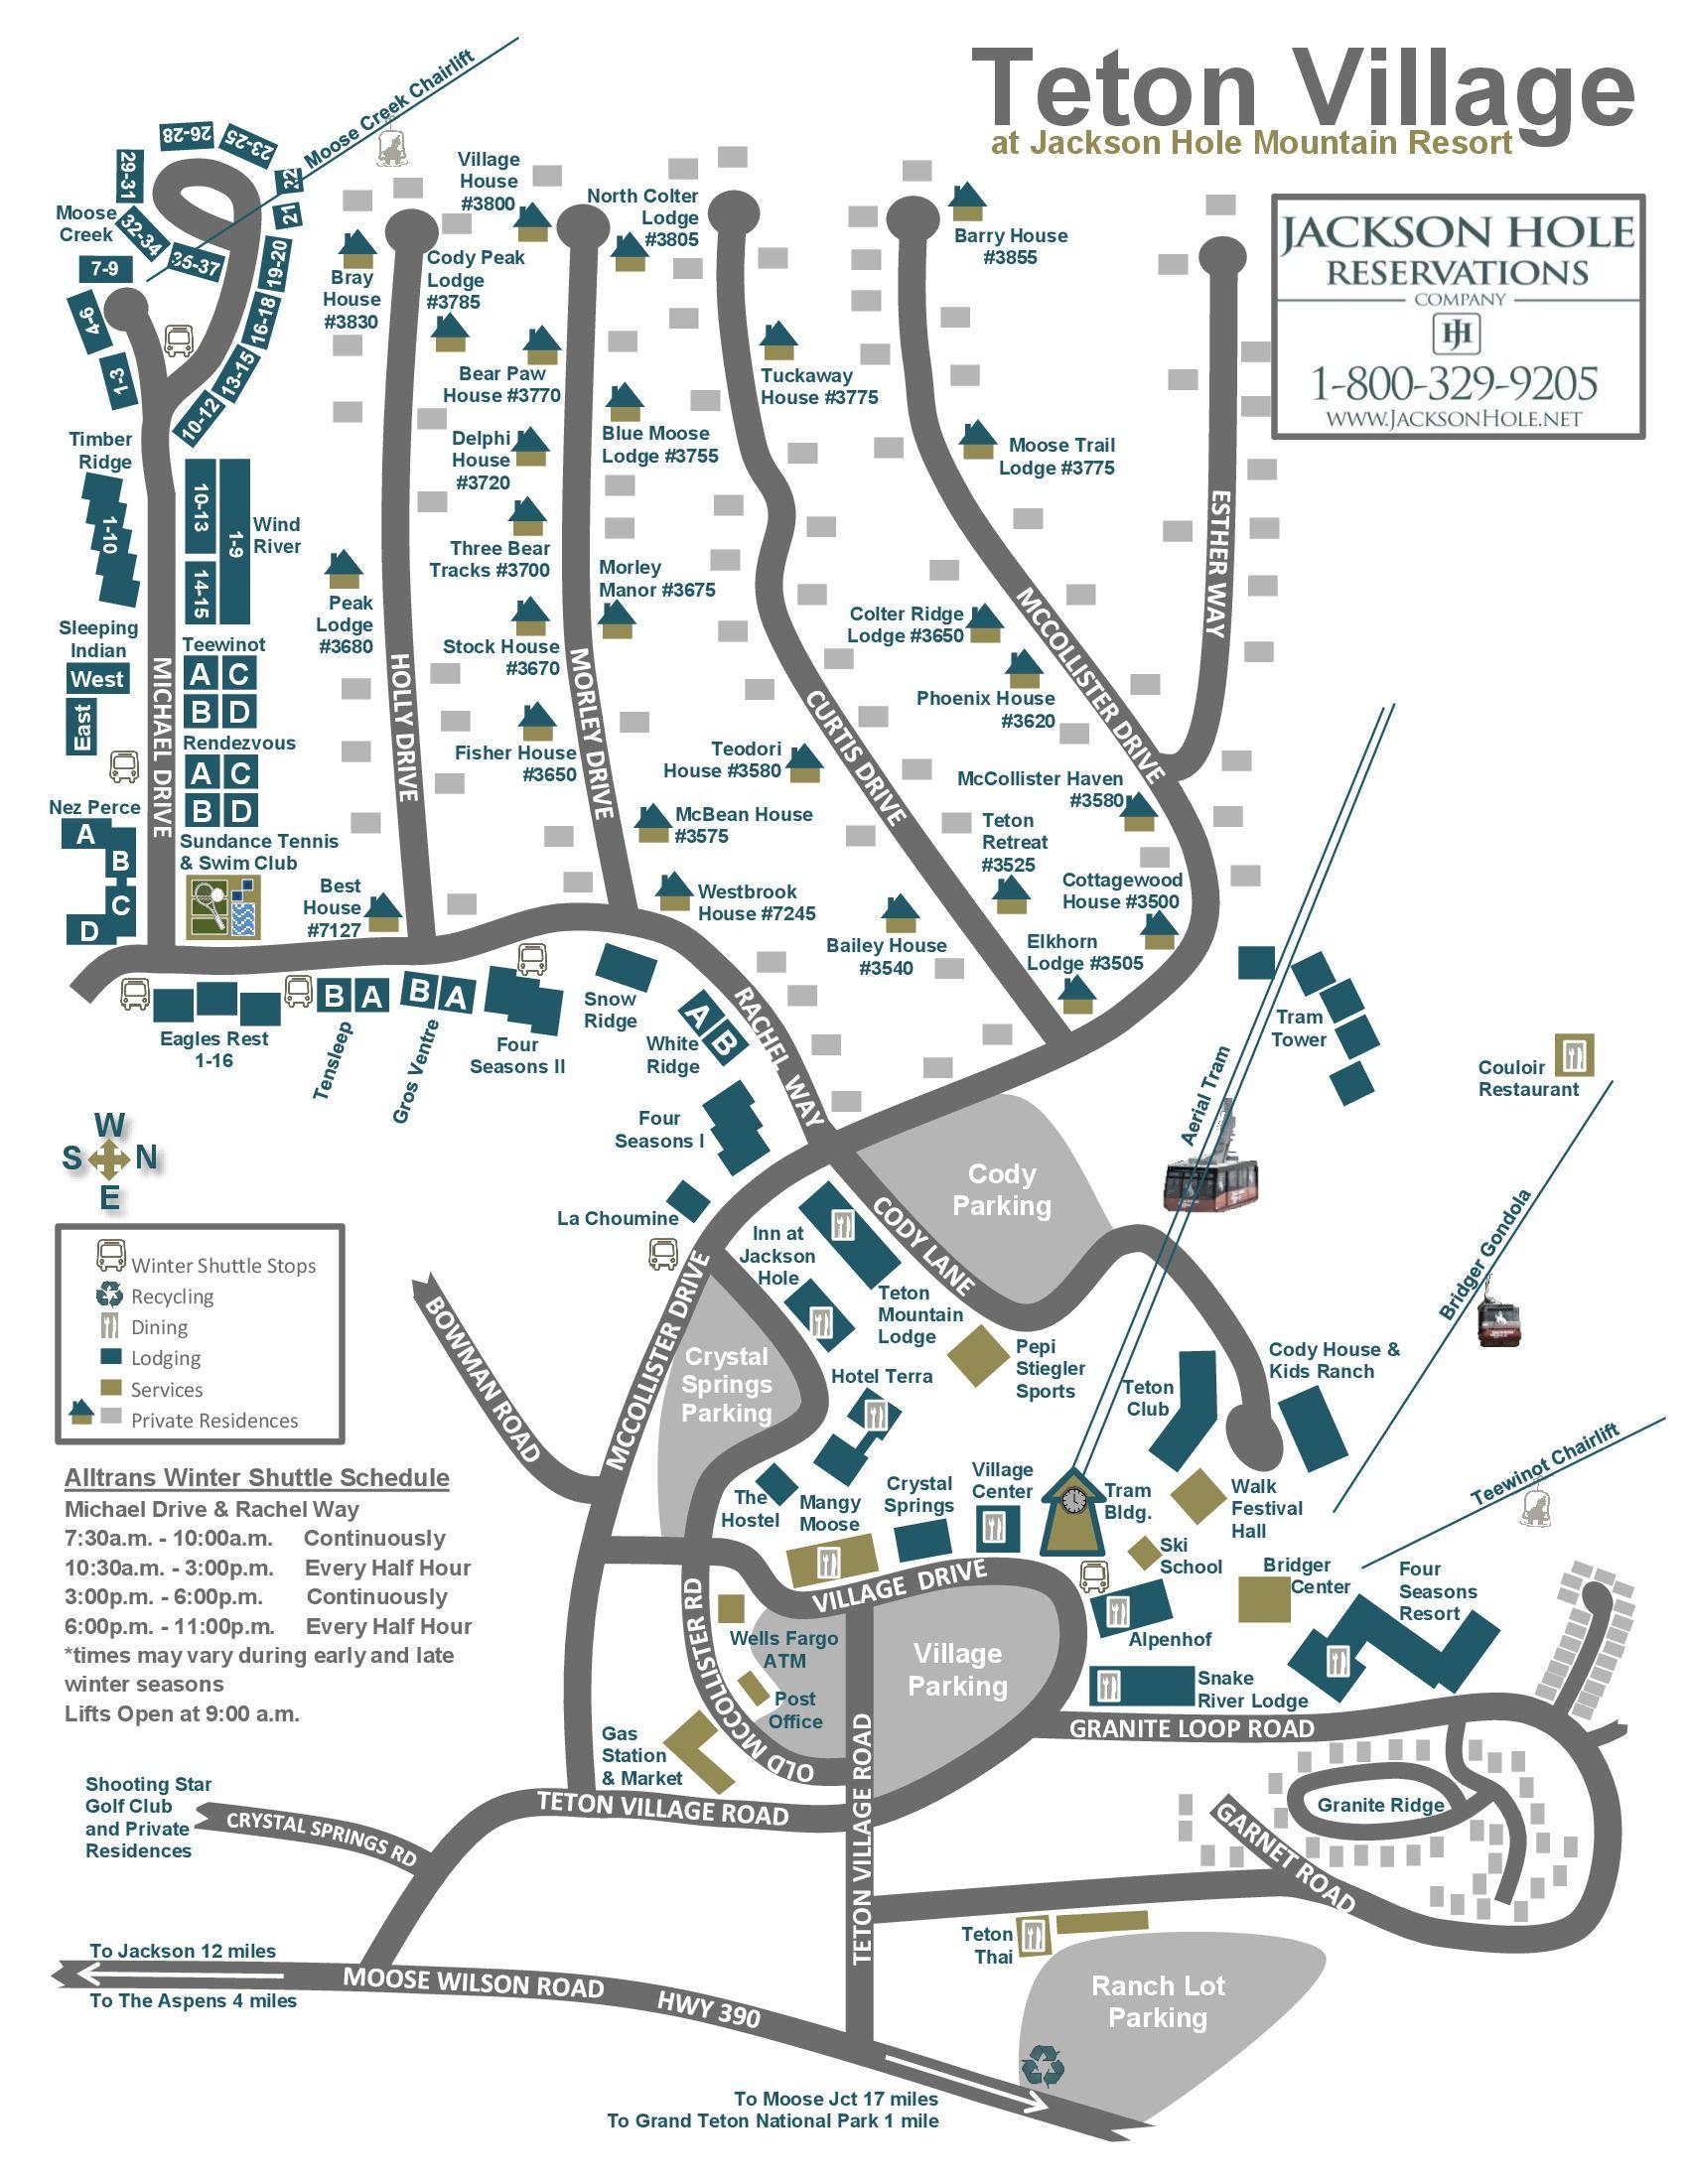 Teton Village Map Teton Village is 12 miles northwest of Jackson